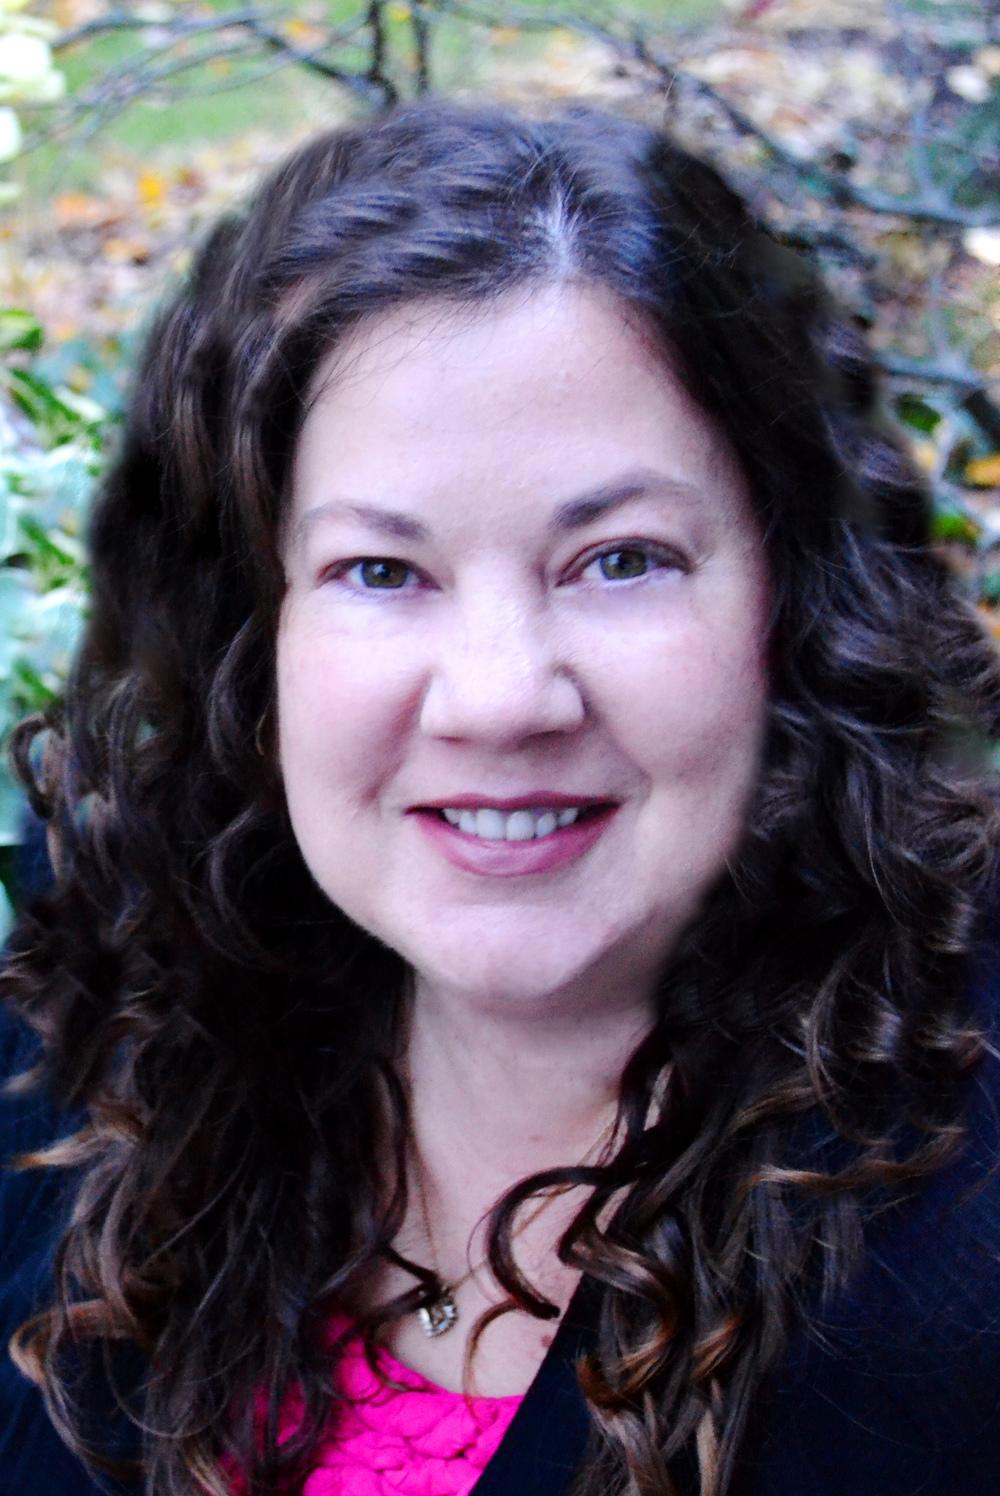 Tonya Atkinson, Licensed Cosmetologist at Serenity Spa in Traverse City, MI.